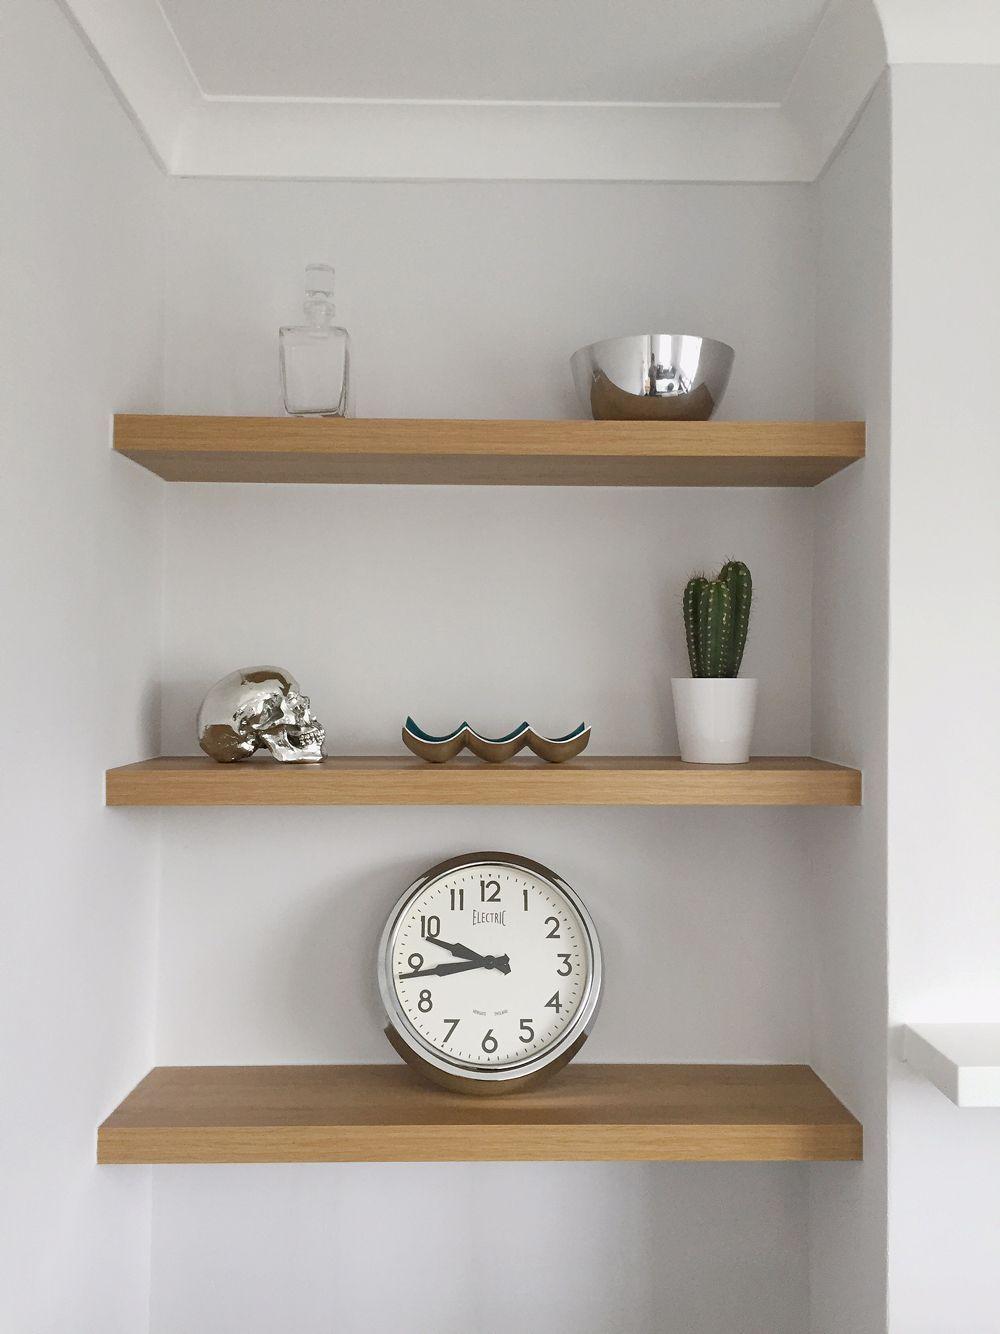 44++ Floating shelves placement ideas ideas